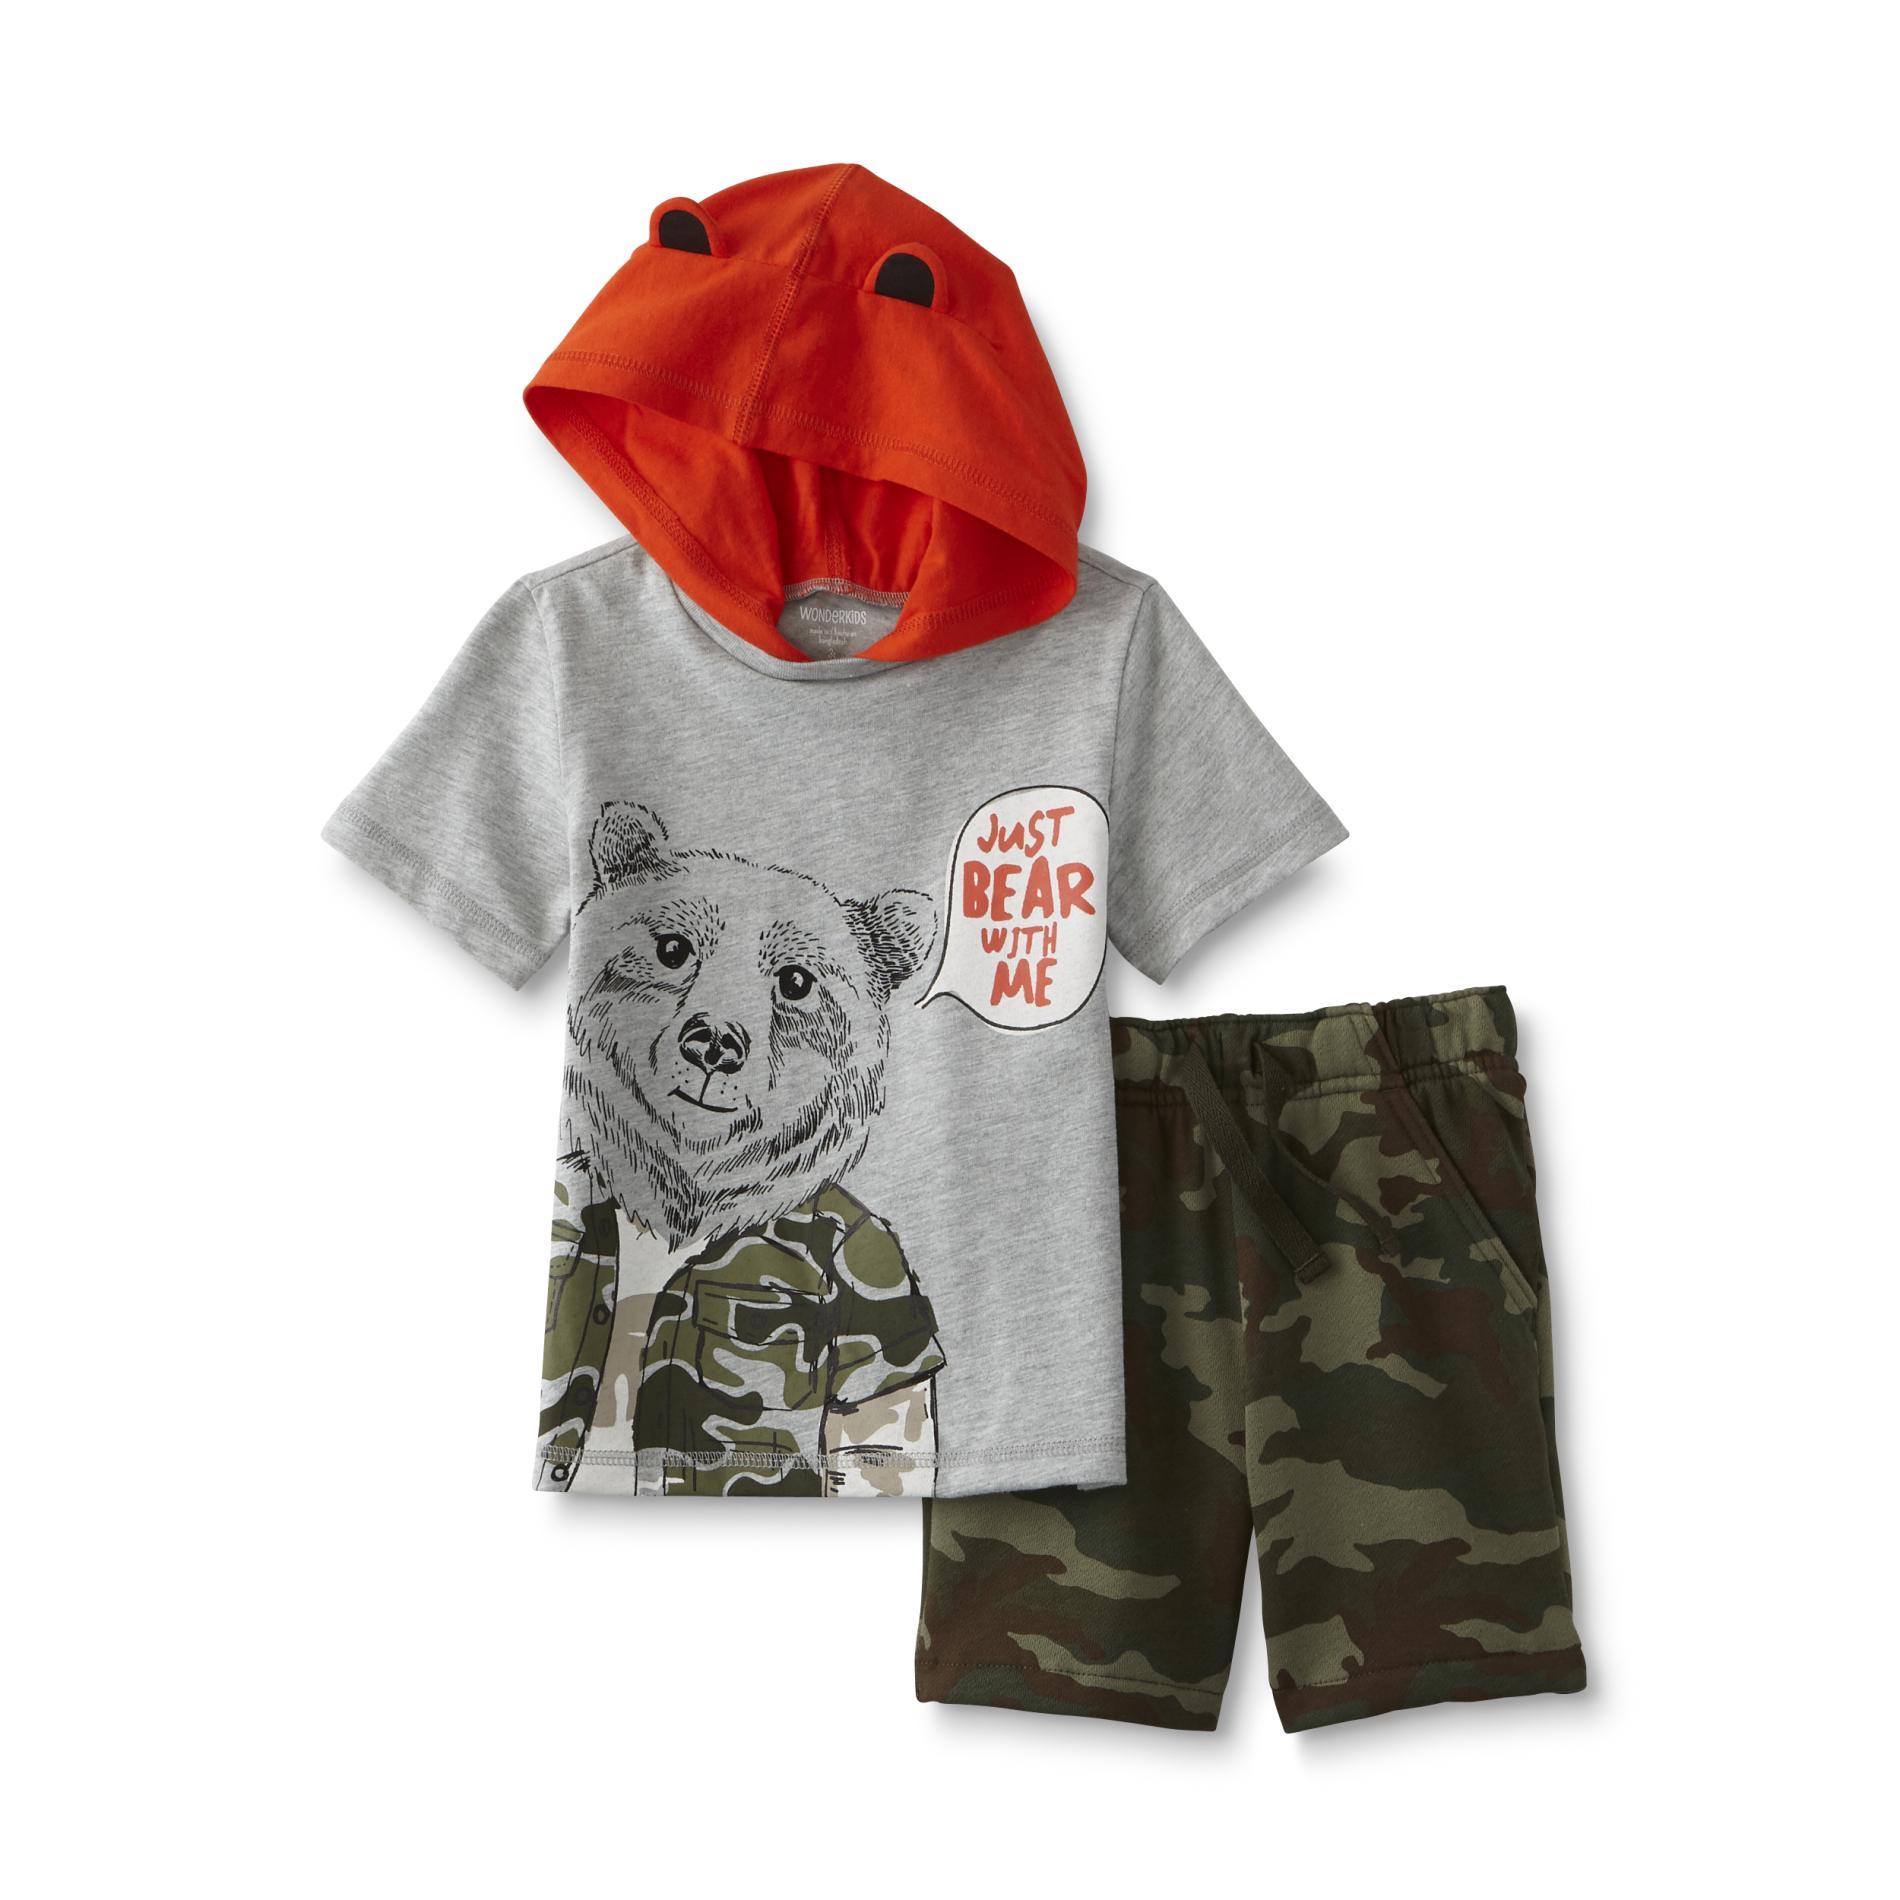 WonderKids Infant & Toddler Boy's T-Shirt & Shorts - Camo